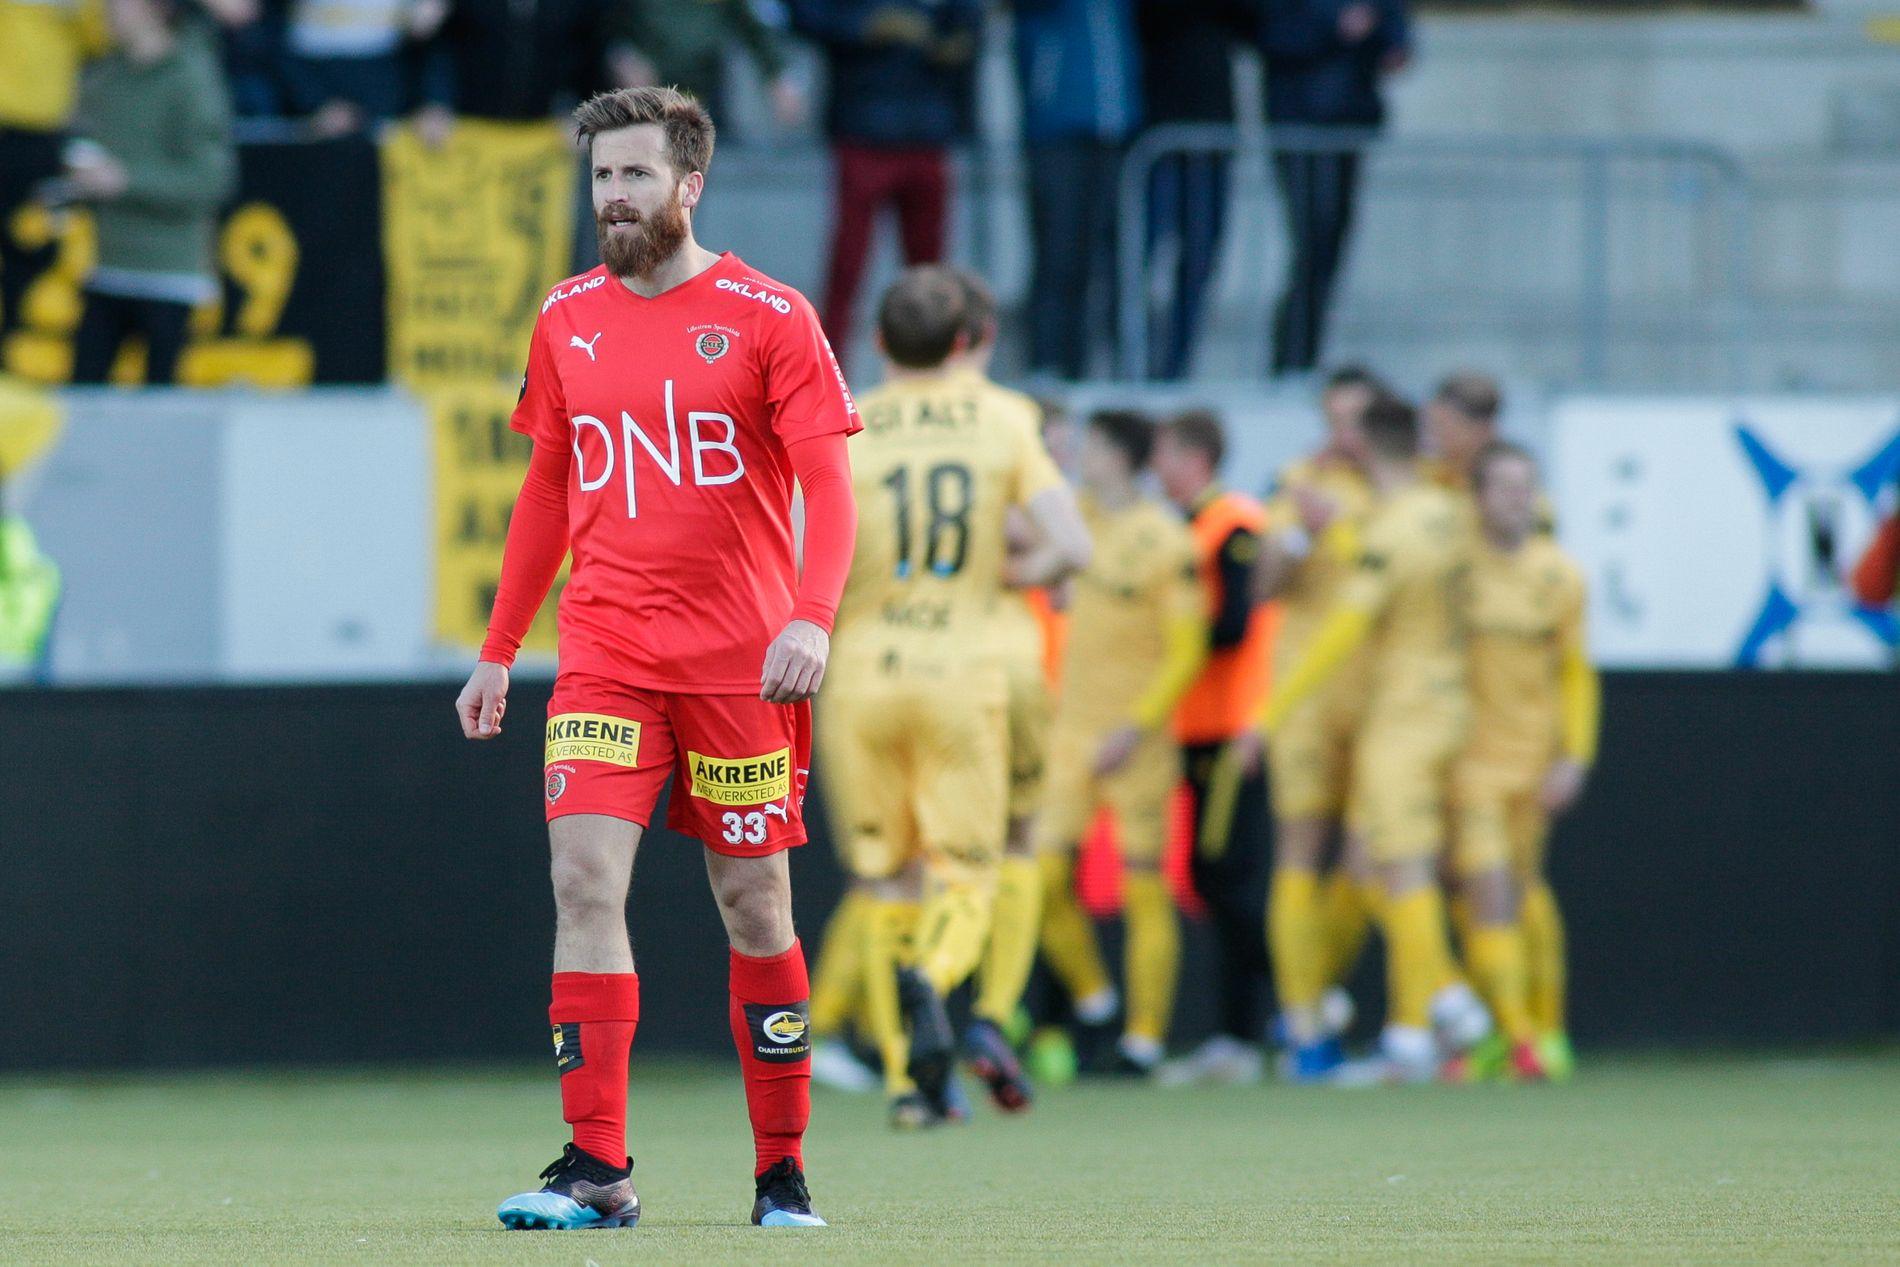 Aleksander Melgalvis har fått en bot på 7500 kroner fra NFF. Foto: Mats Torbergsen / NTB scanpix